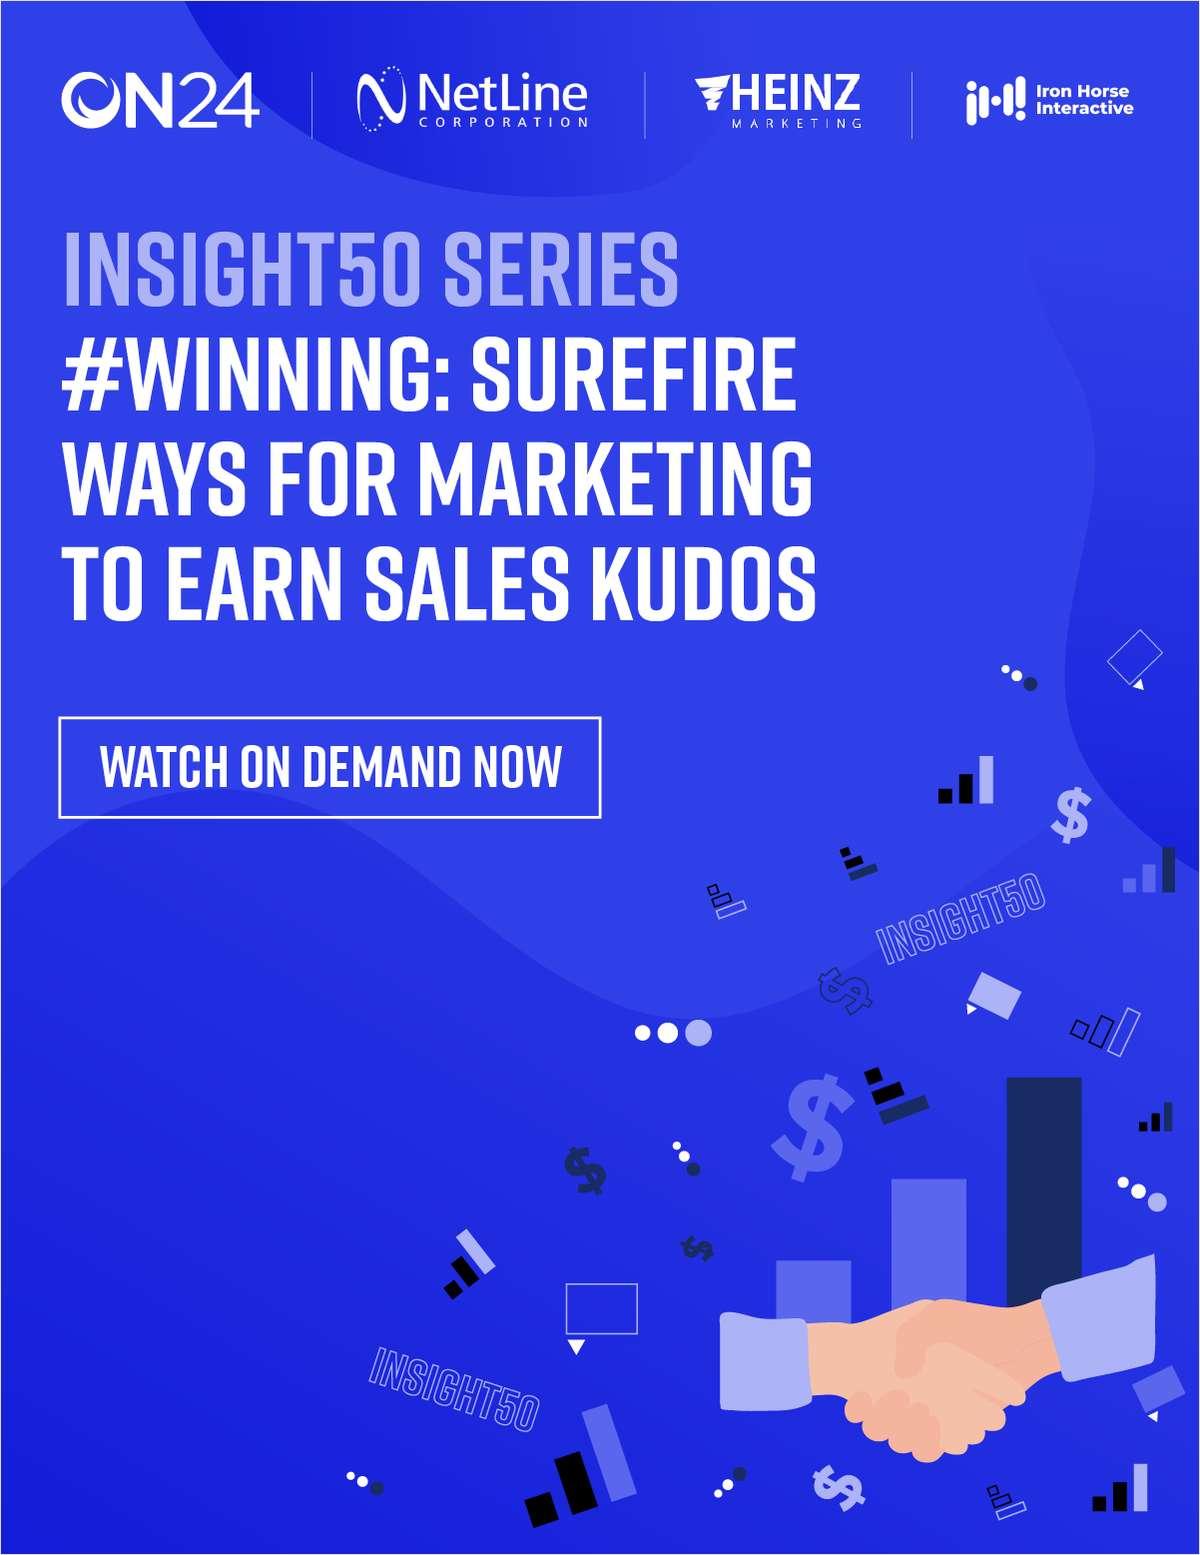 #Winning: Surefire for Marketing to Earn Sales Kudos